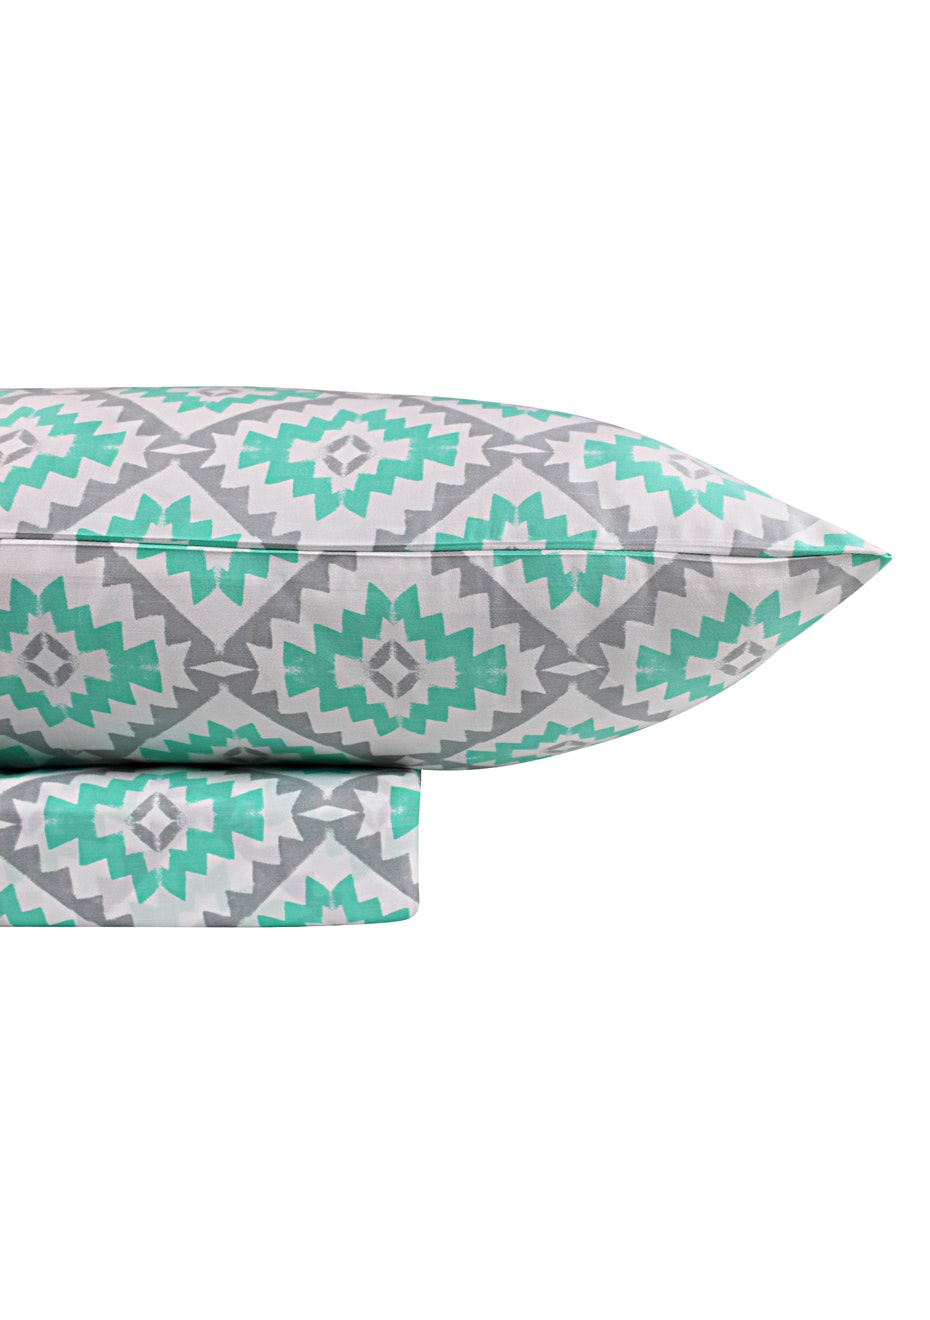 1000 Thread Count –Yukata Print Sheet Sets -Mint | Silver - Queen Bed